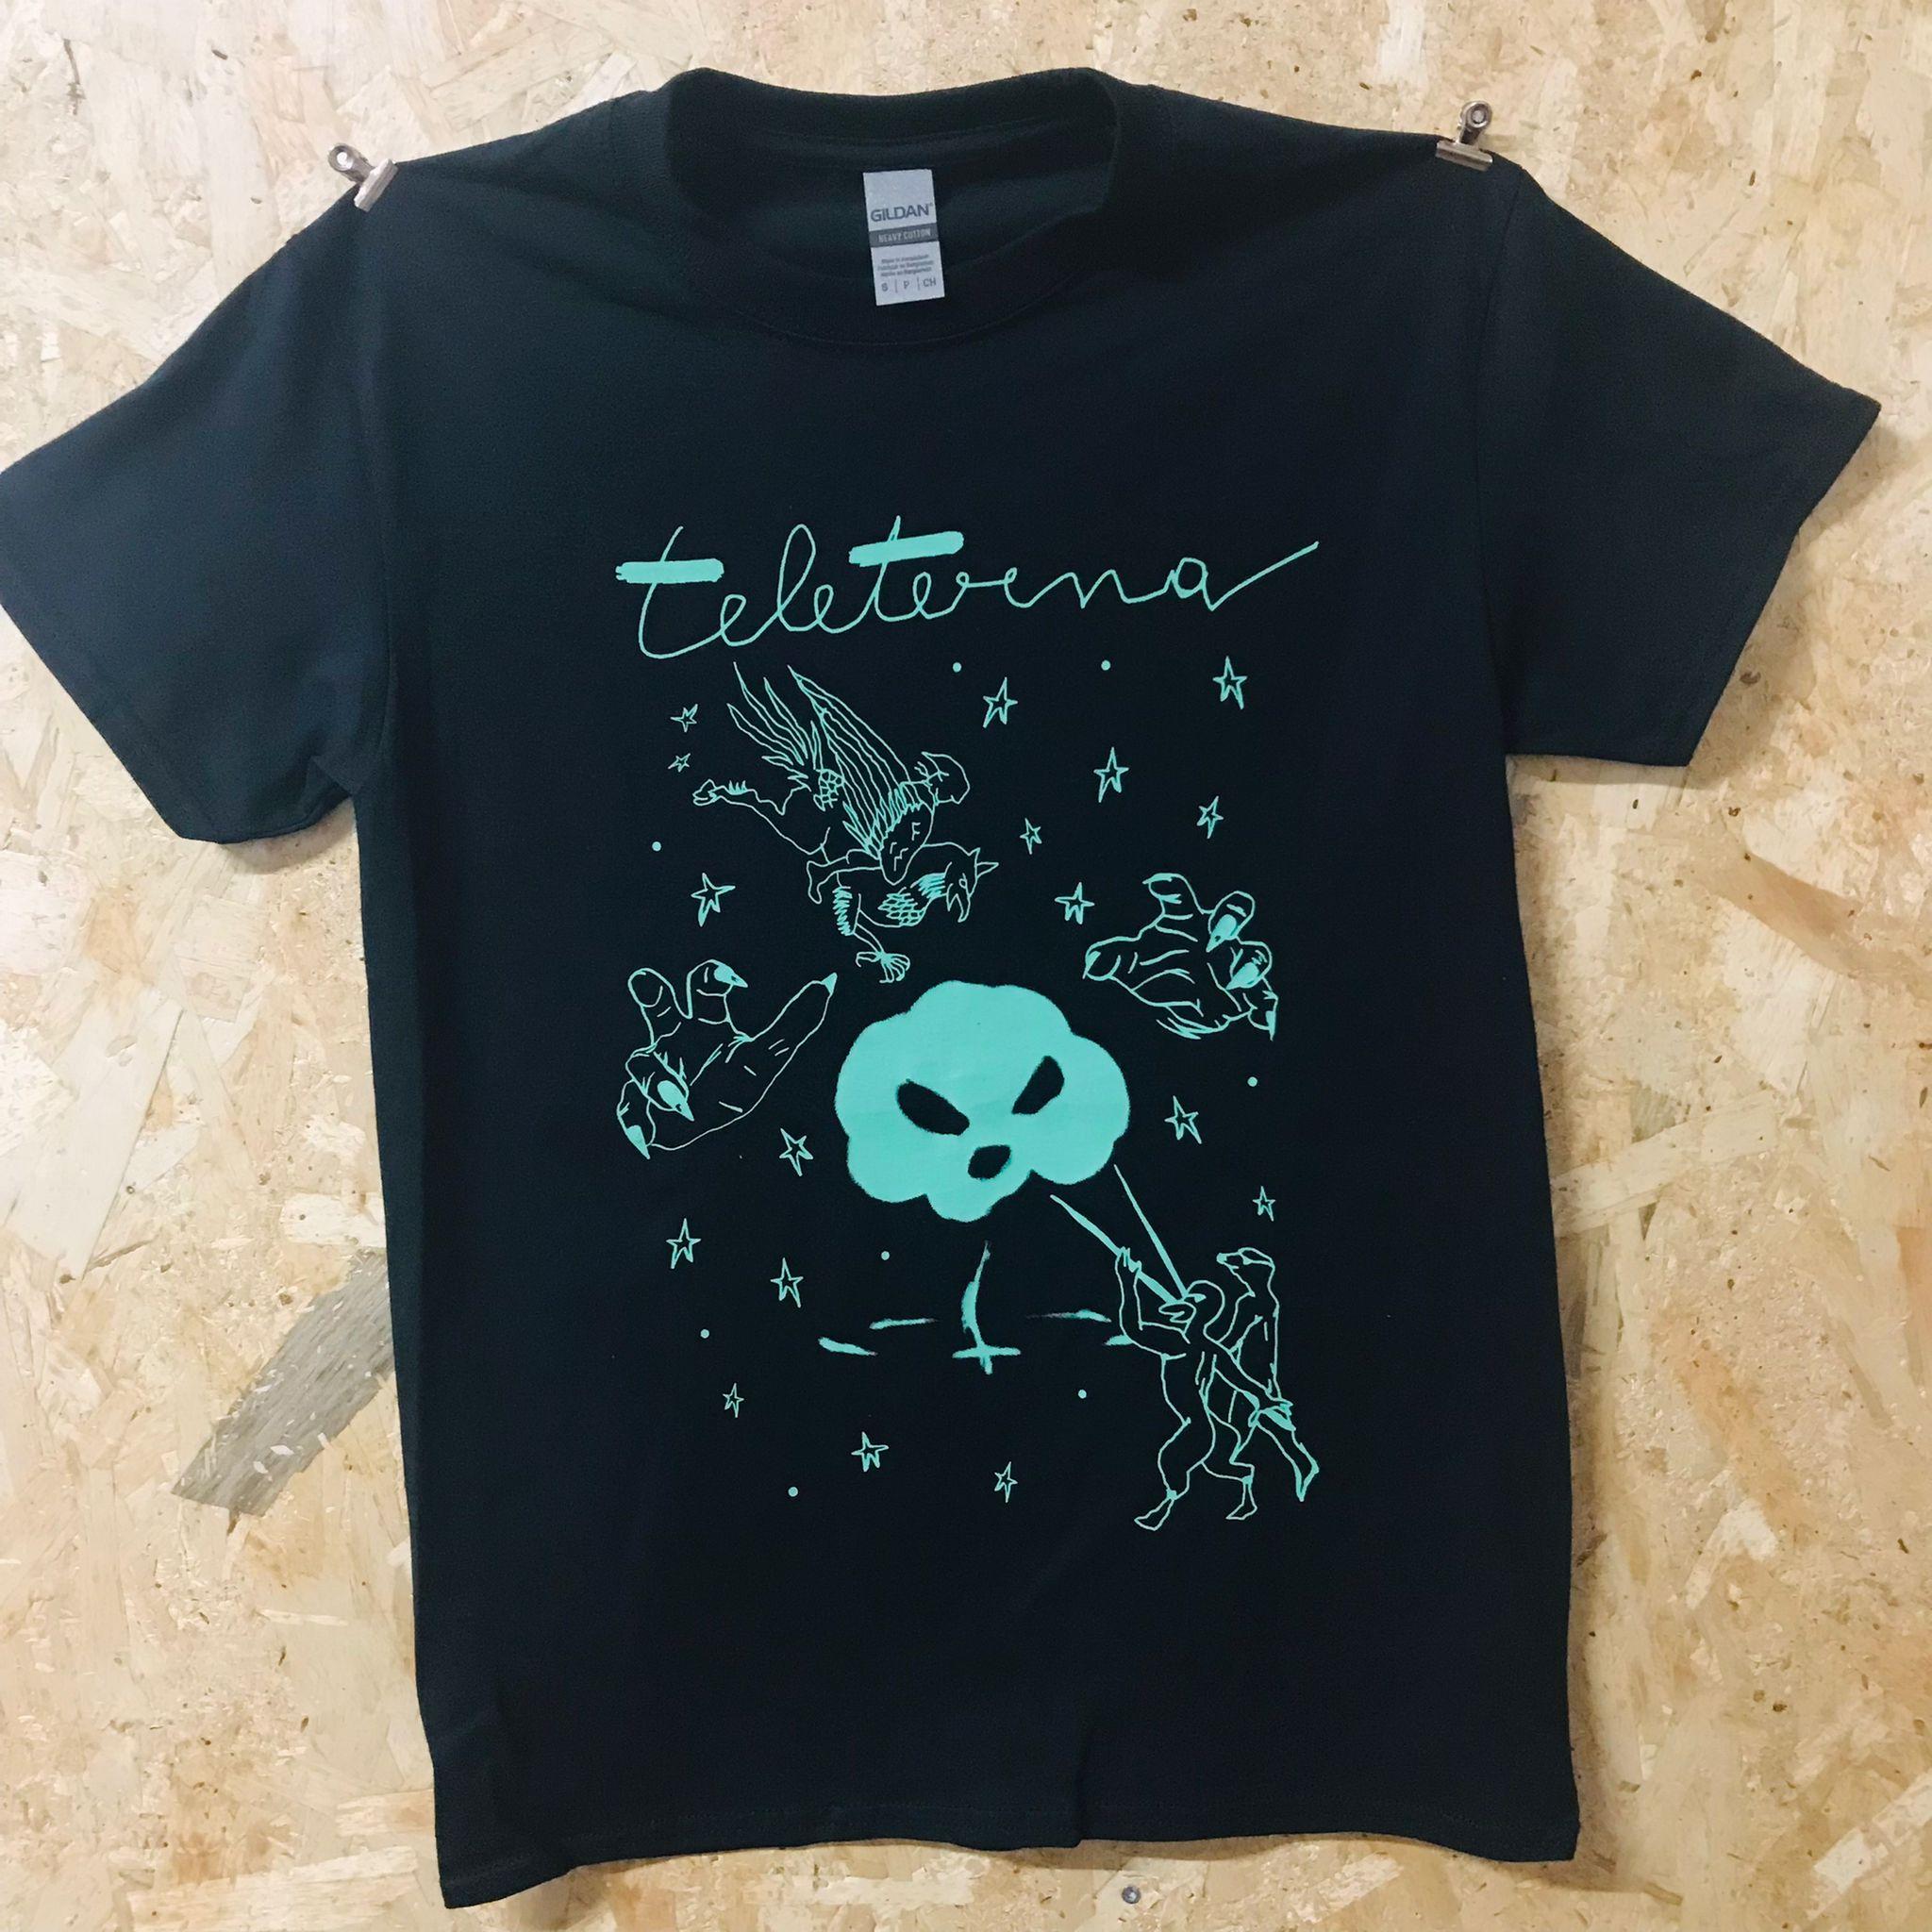 Teleterna - Tshirt